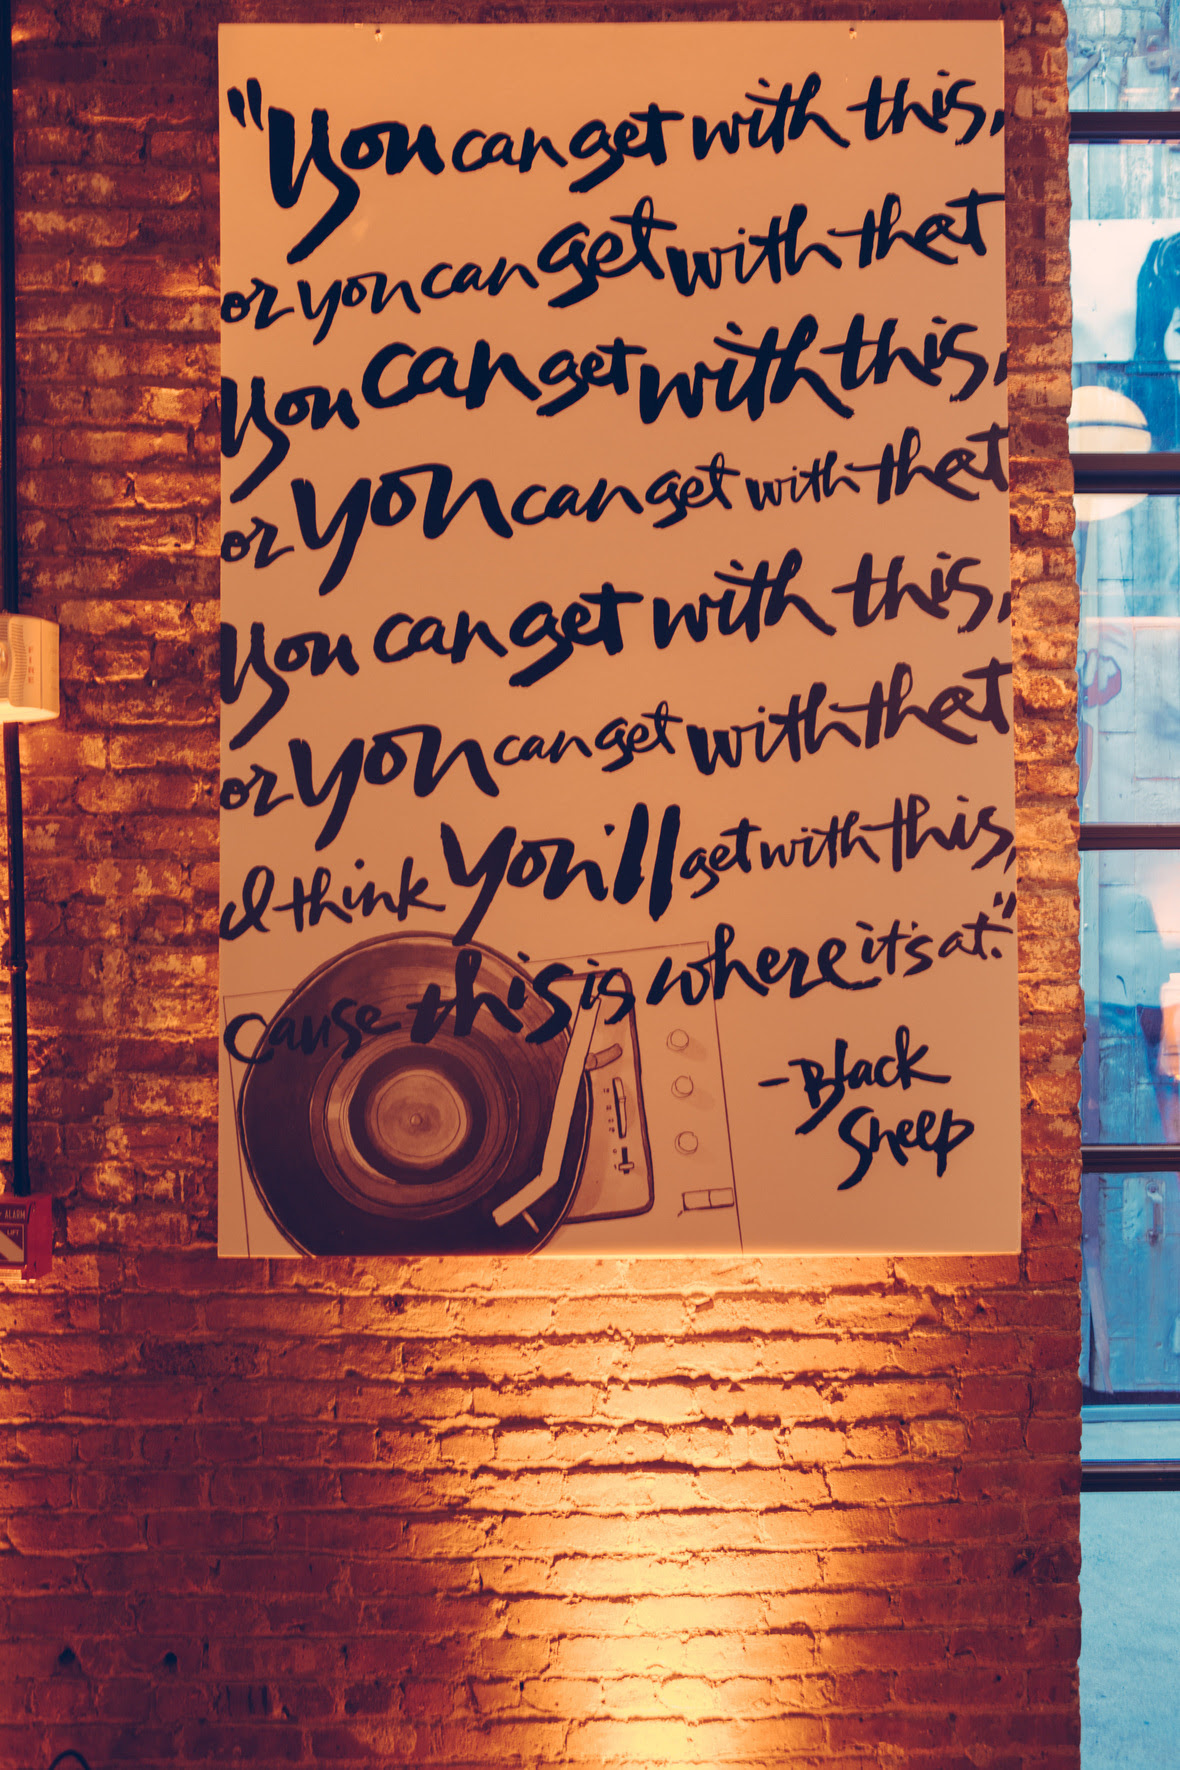 Art piece by Katie Fischer Design. Hand-lettering by Paperfinger.